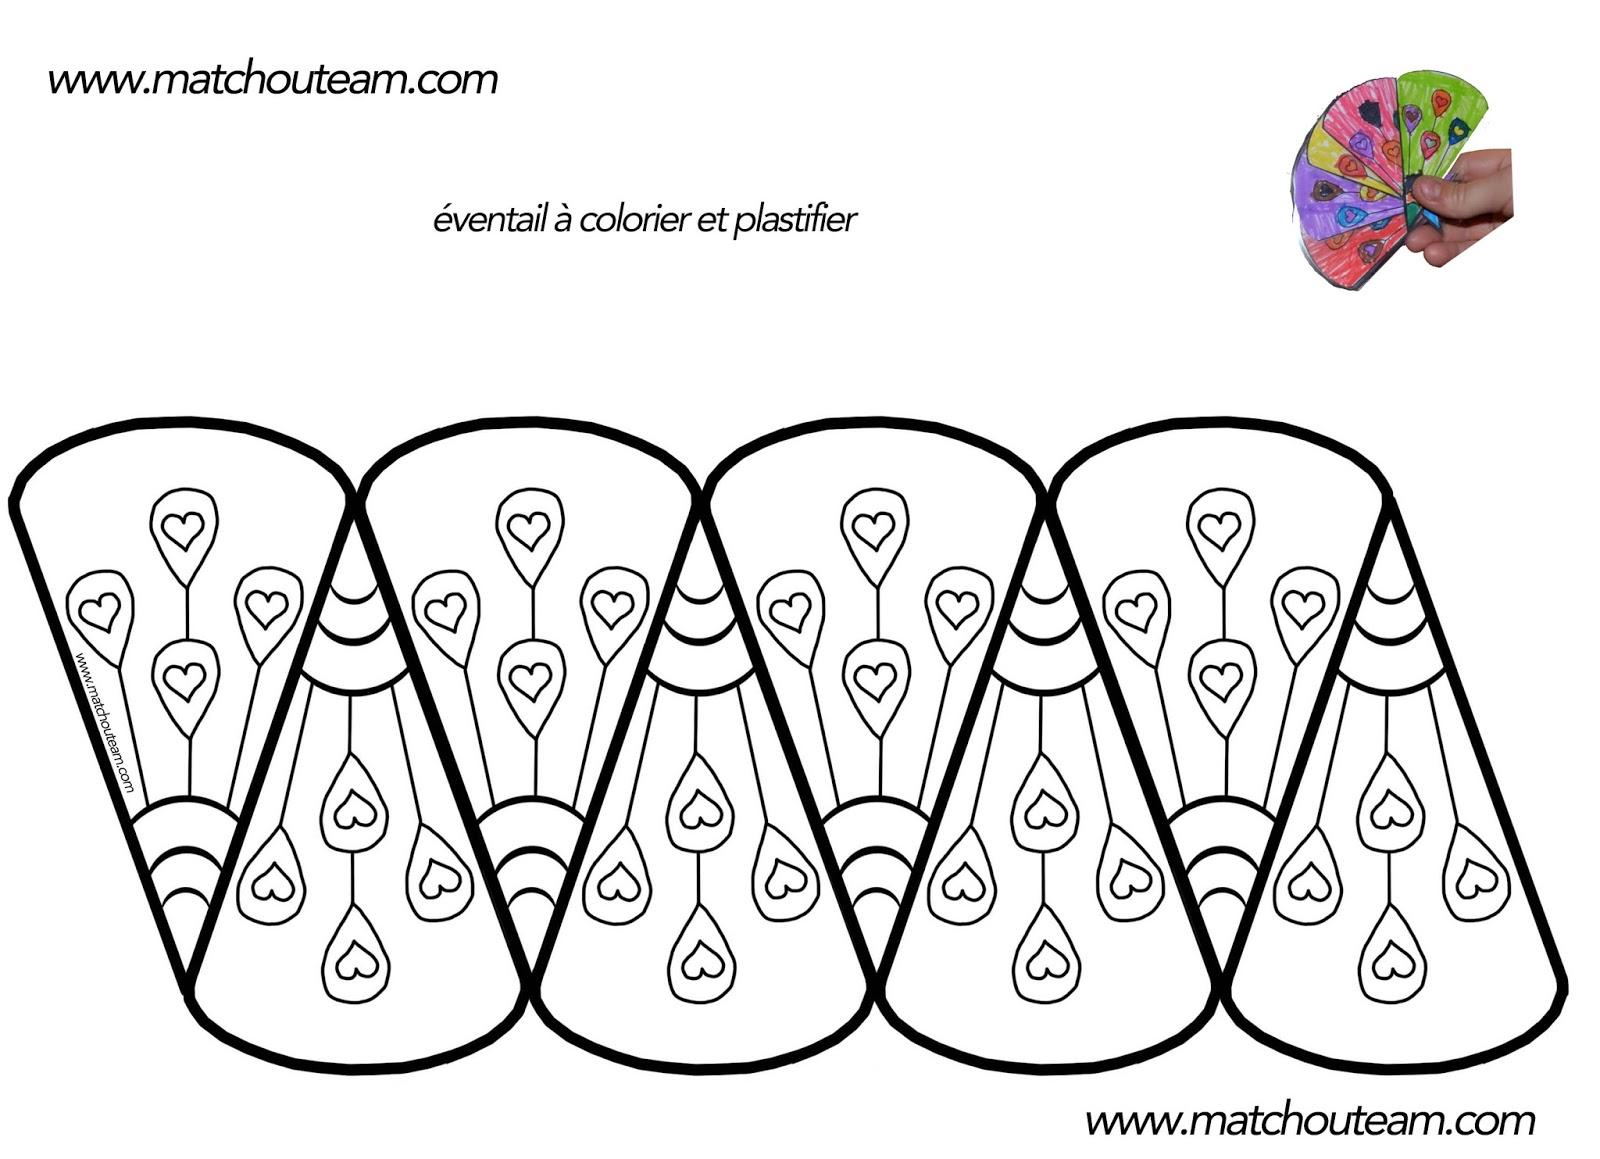 ma tchou team coloriage d 39 un ventail plastifier. Black Bedroom Furniture Sets. Home Design Ideas